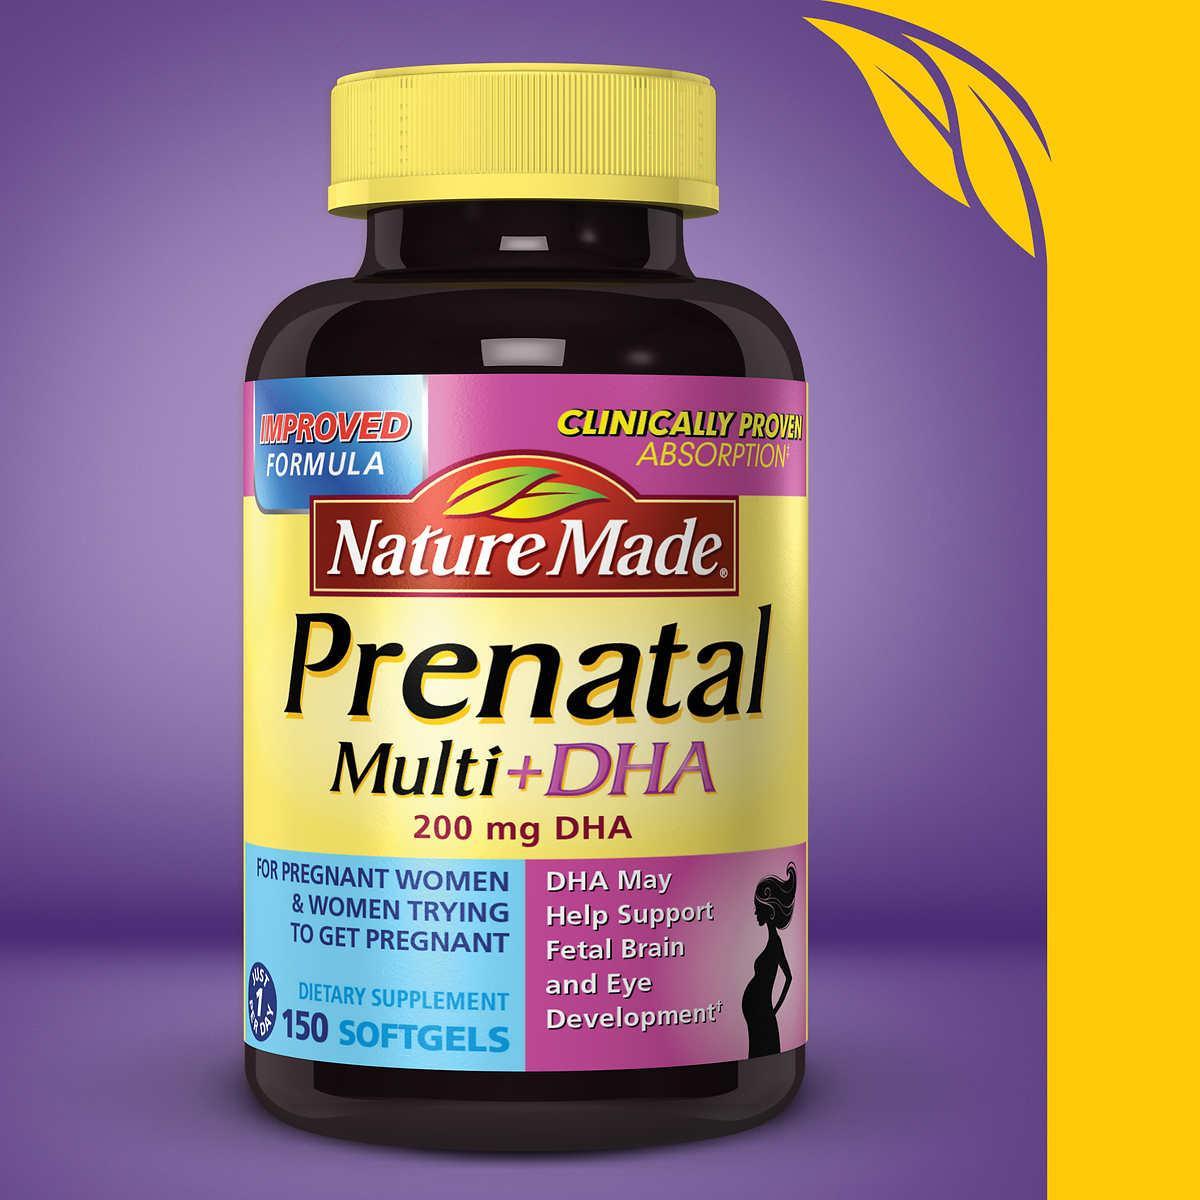 d9c1cabbd380e Healthy Pregnancy brands - Prenatal Care on sale, prices, set ...